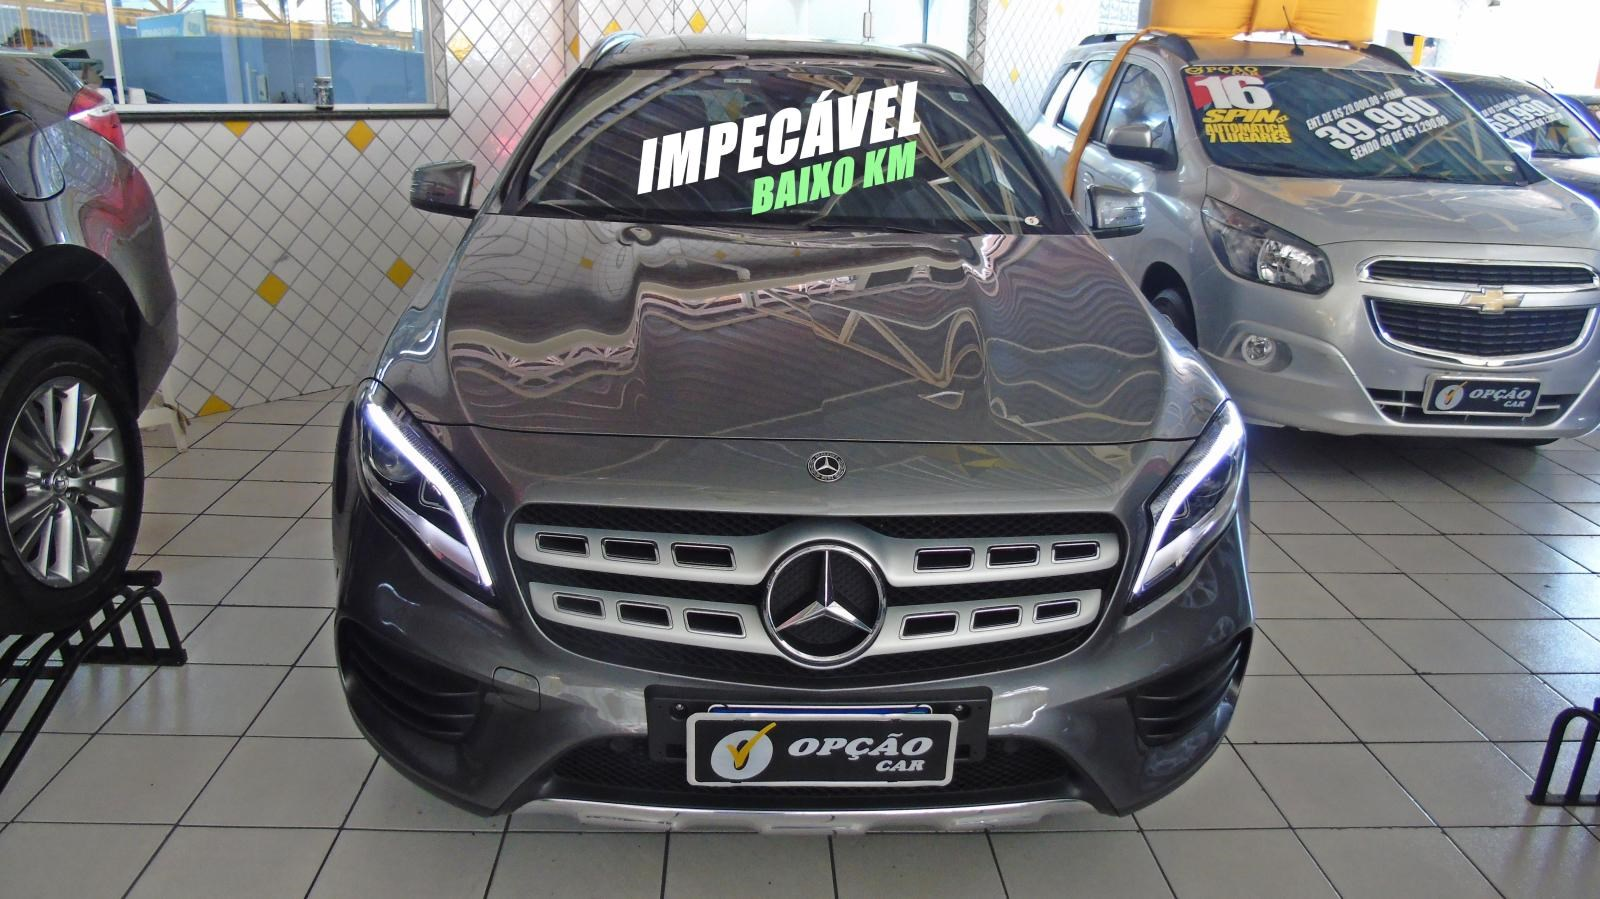 //www.autoline.com.br/carro/mercedes-benz/gla-250-20-sport-4matic-16v-gasolina-4p-turbo-automat/2018/sao-paulo-sp/14548612